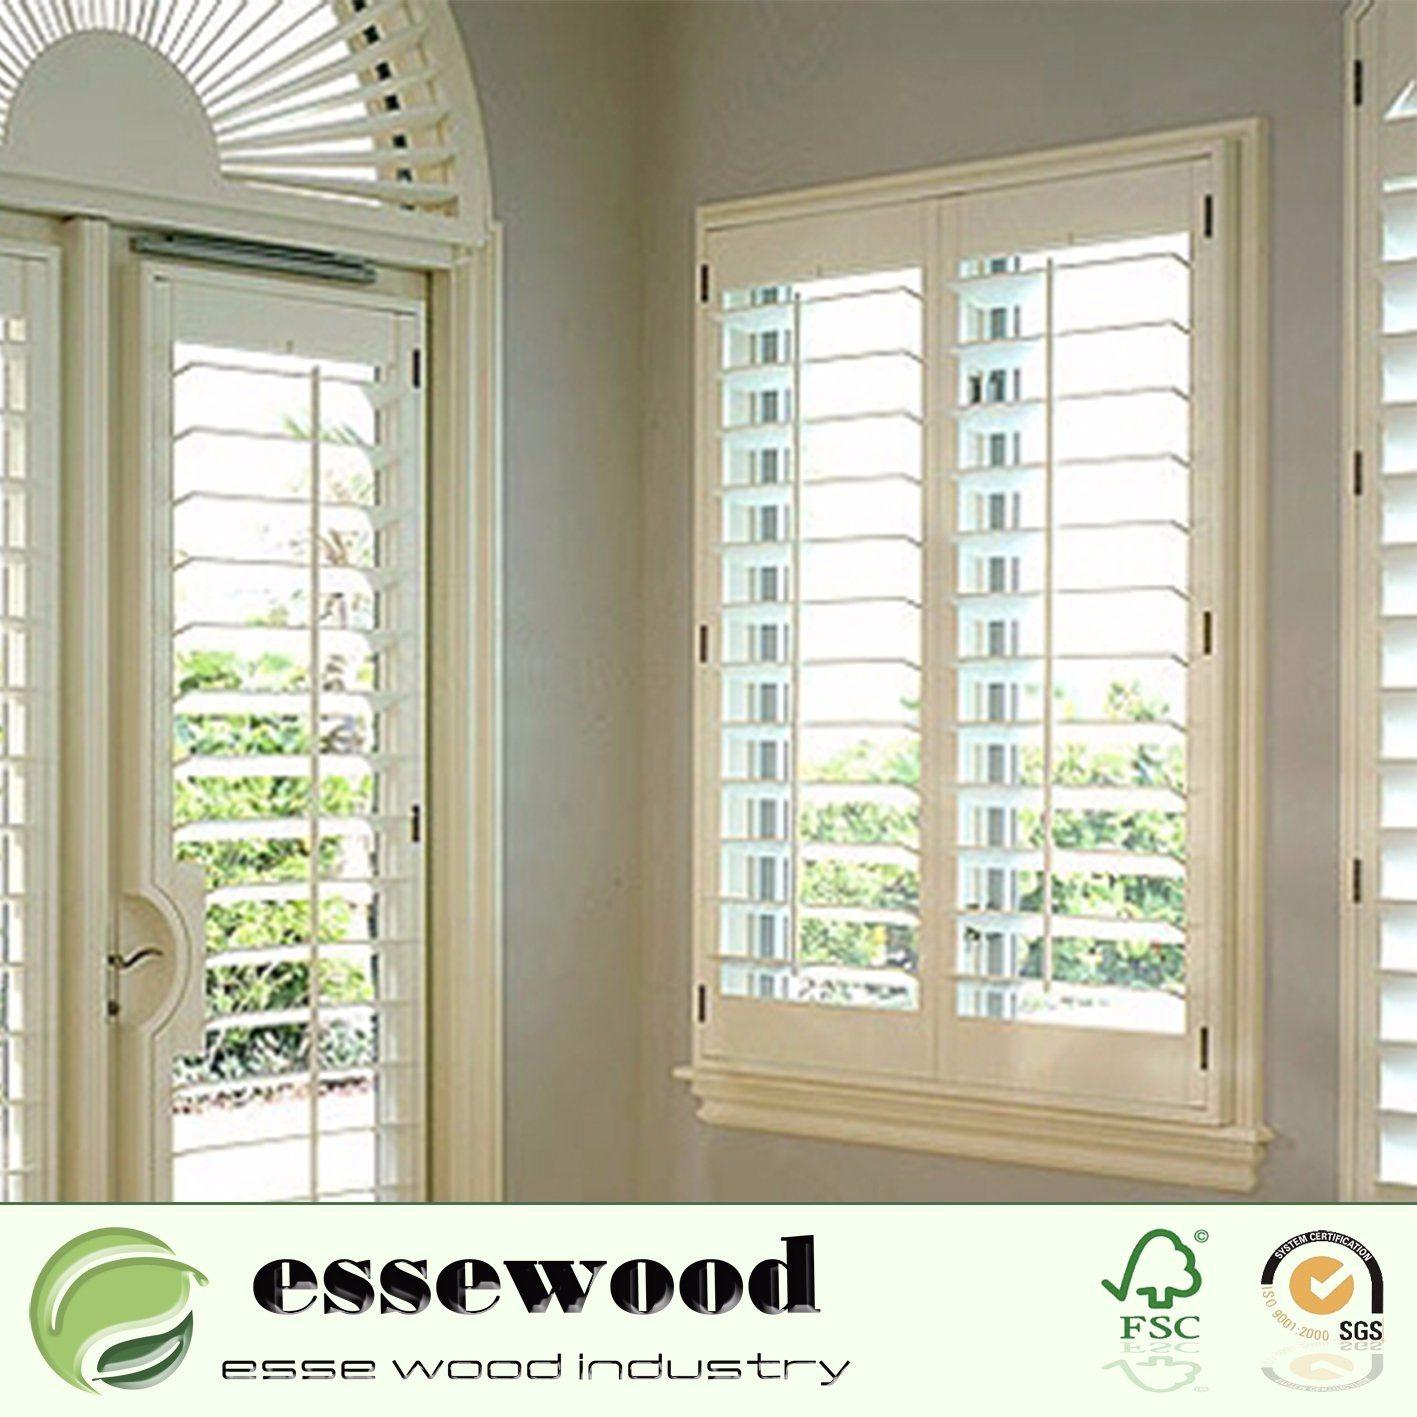 Hot Item Painted Color Sliding Wood Or Pvc Plantation Shutters Sliding Doors For House Decoration